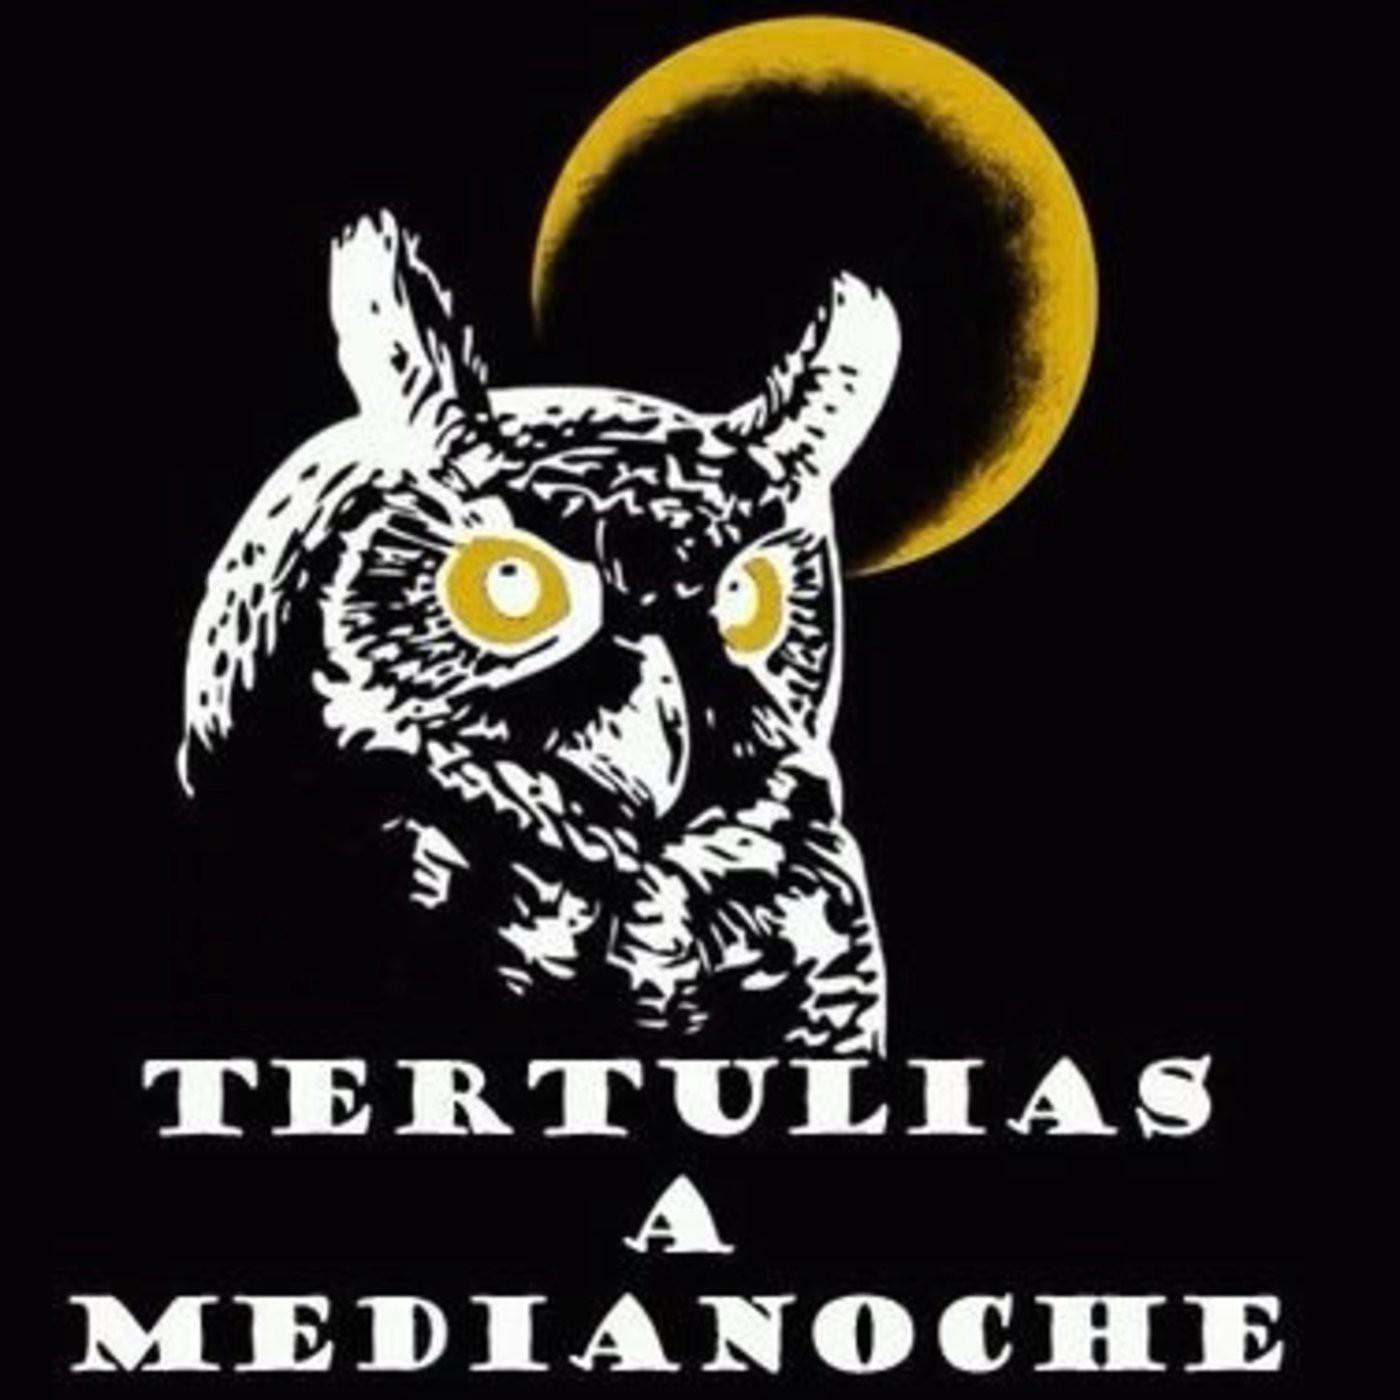 <![CDATA[Tertulias a Medianoche]]>